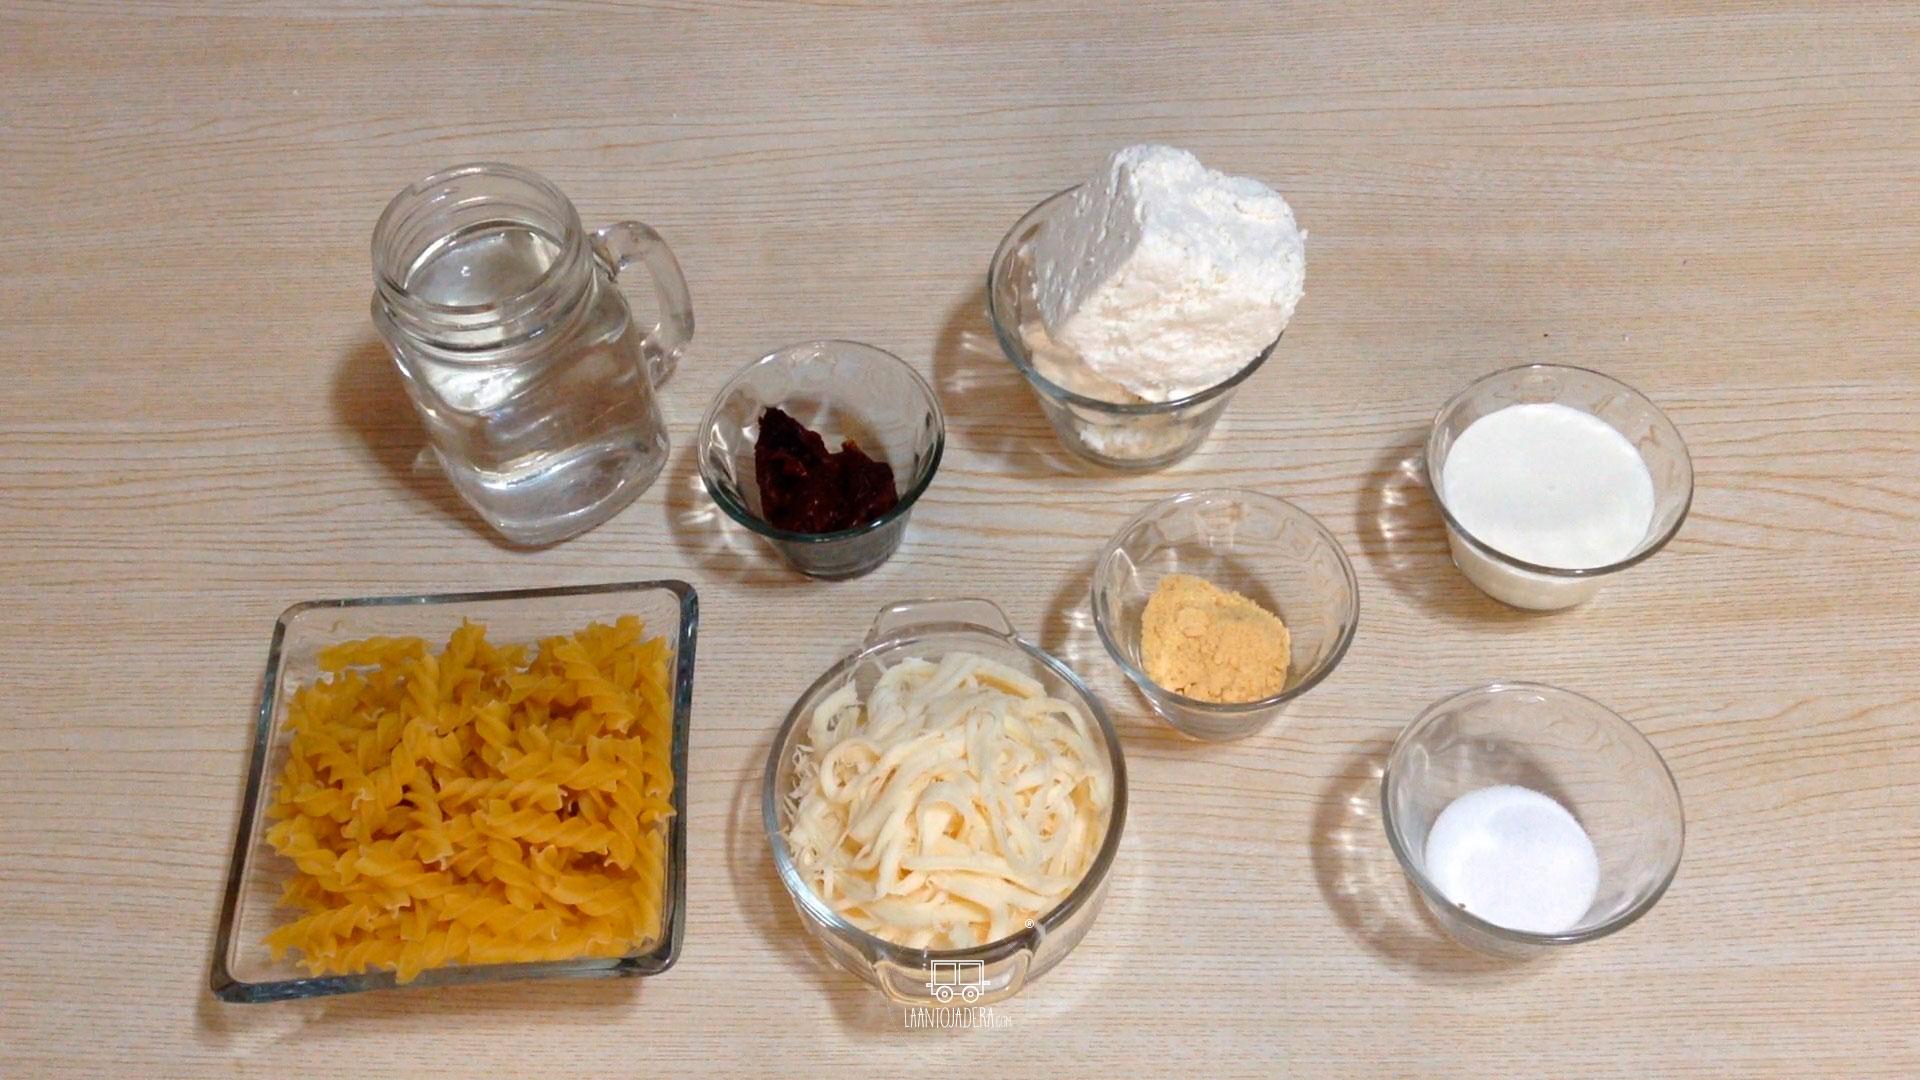 La Antojadera | Pasta al Chipotle